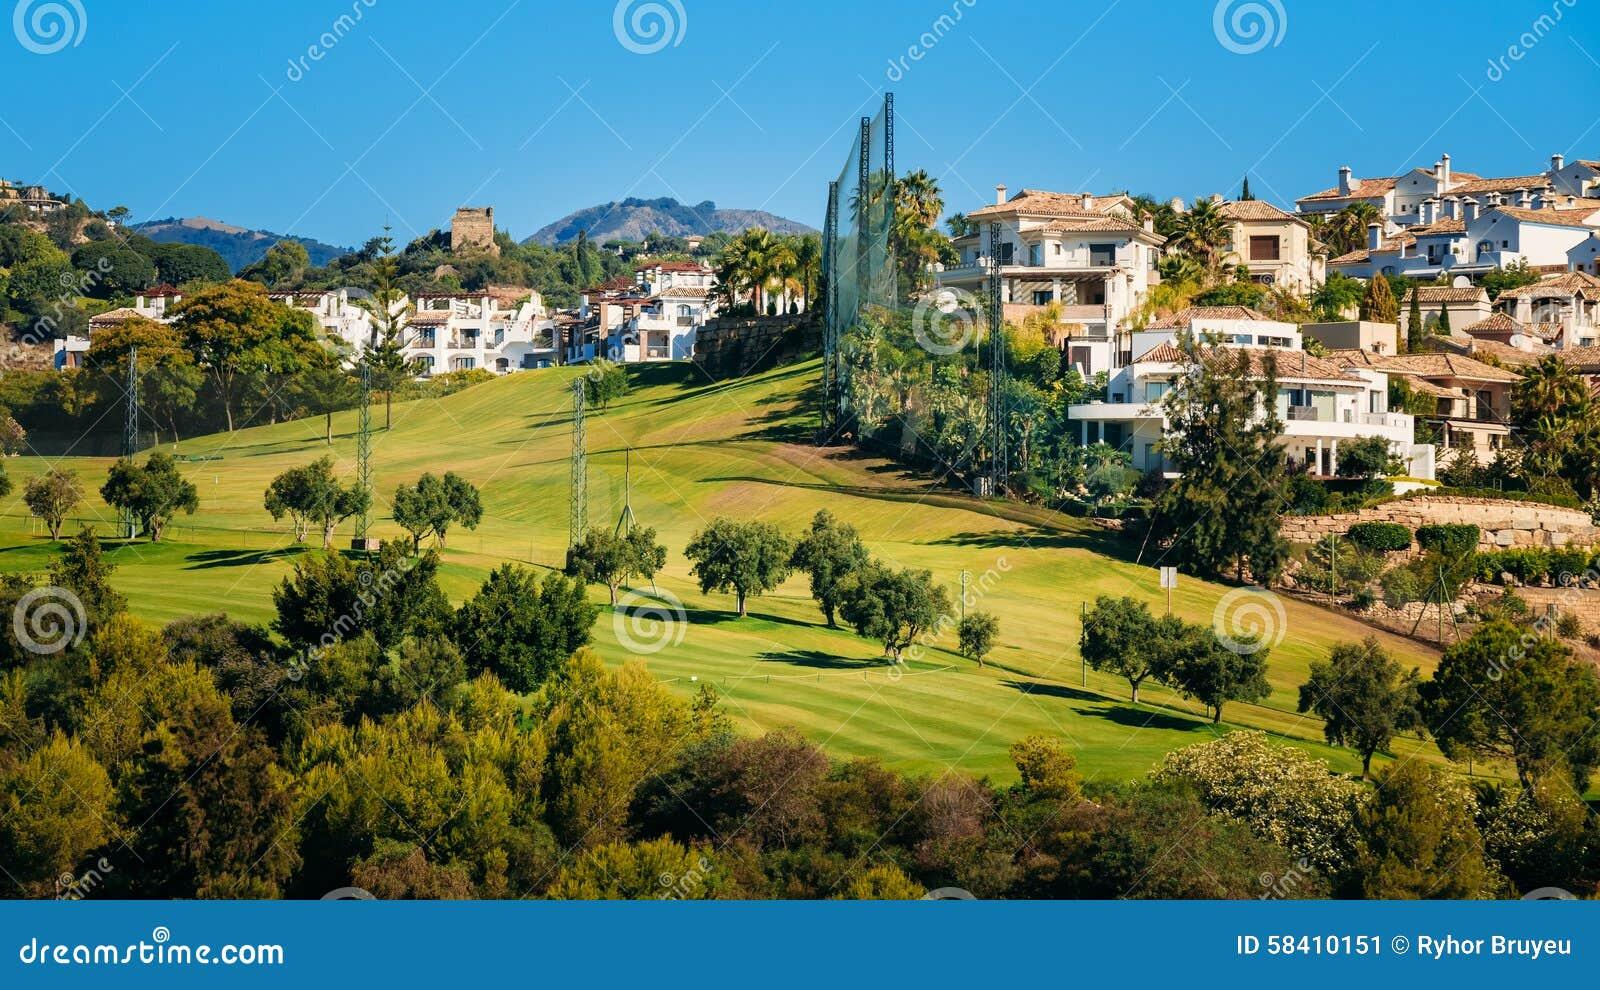 Spanish Villa House Plans Benahavis In Malaga Andalusia Spain Summer Stock Photo